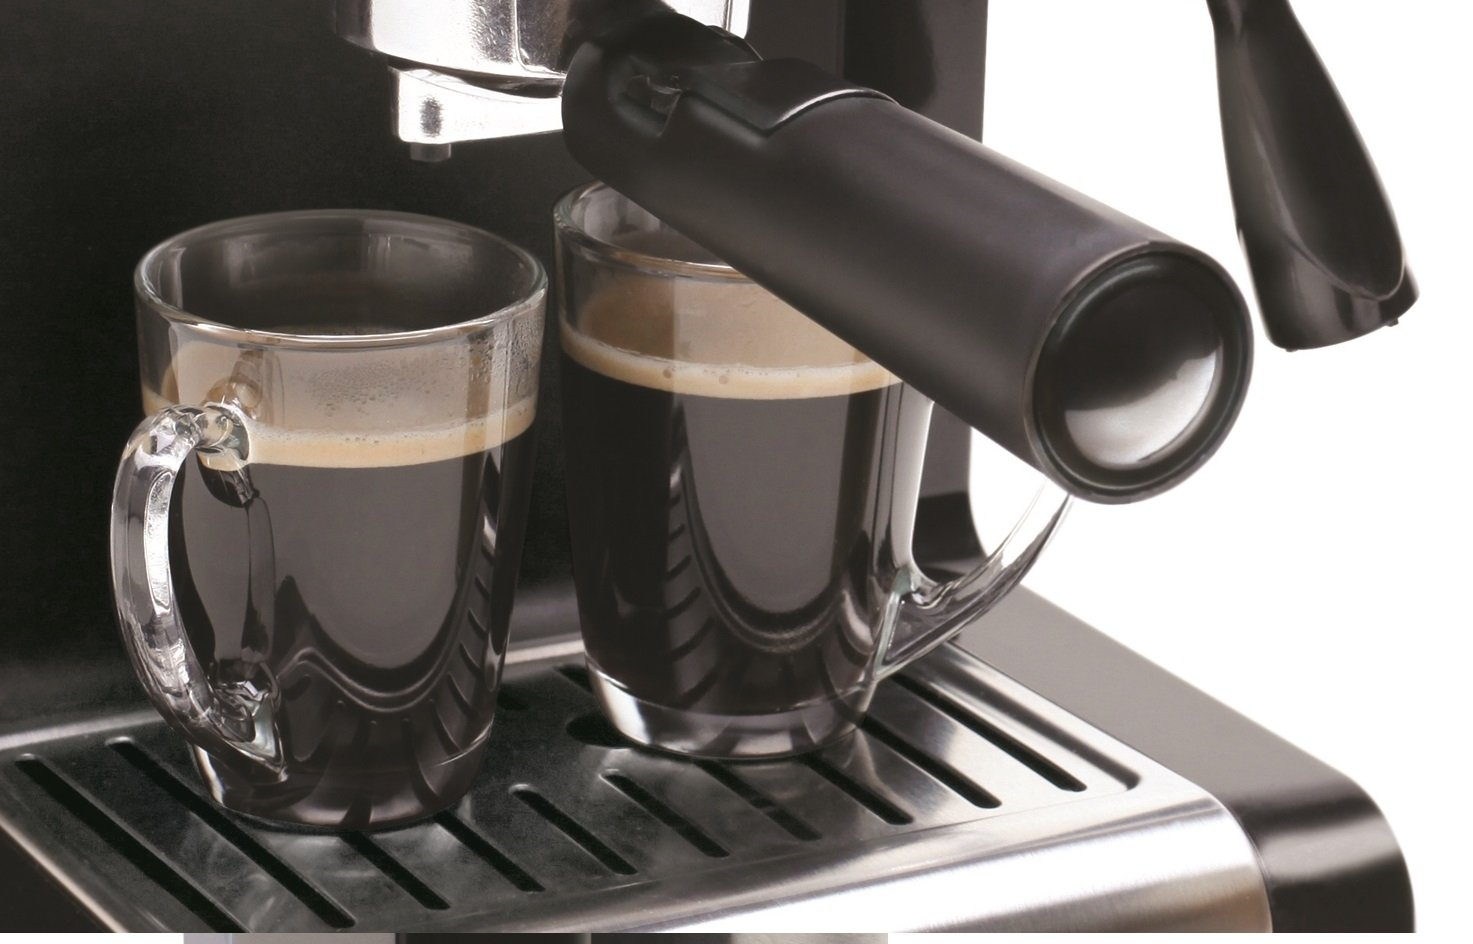 Capresso 116.04 Pump Espresso and Cappuccino Machine EC100, Black and Stainless by Capresso (Image #6)